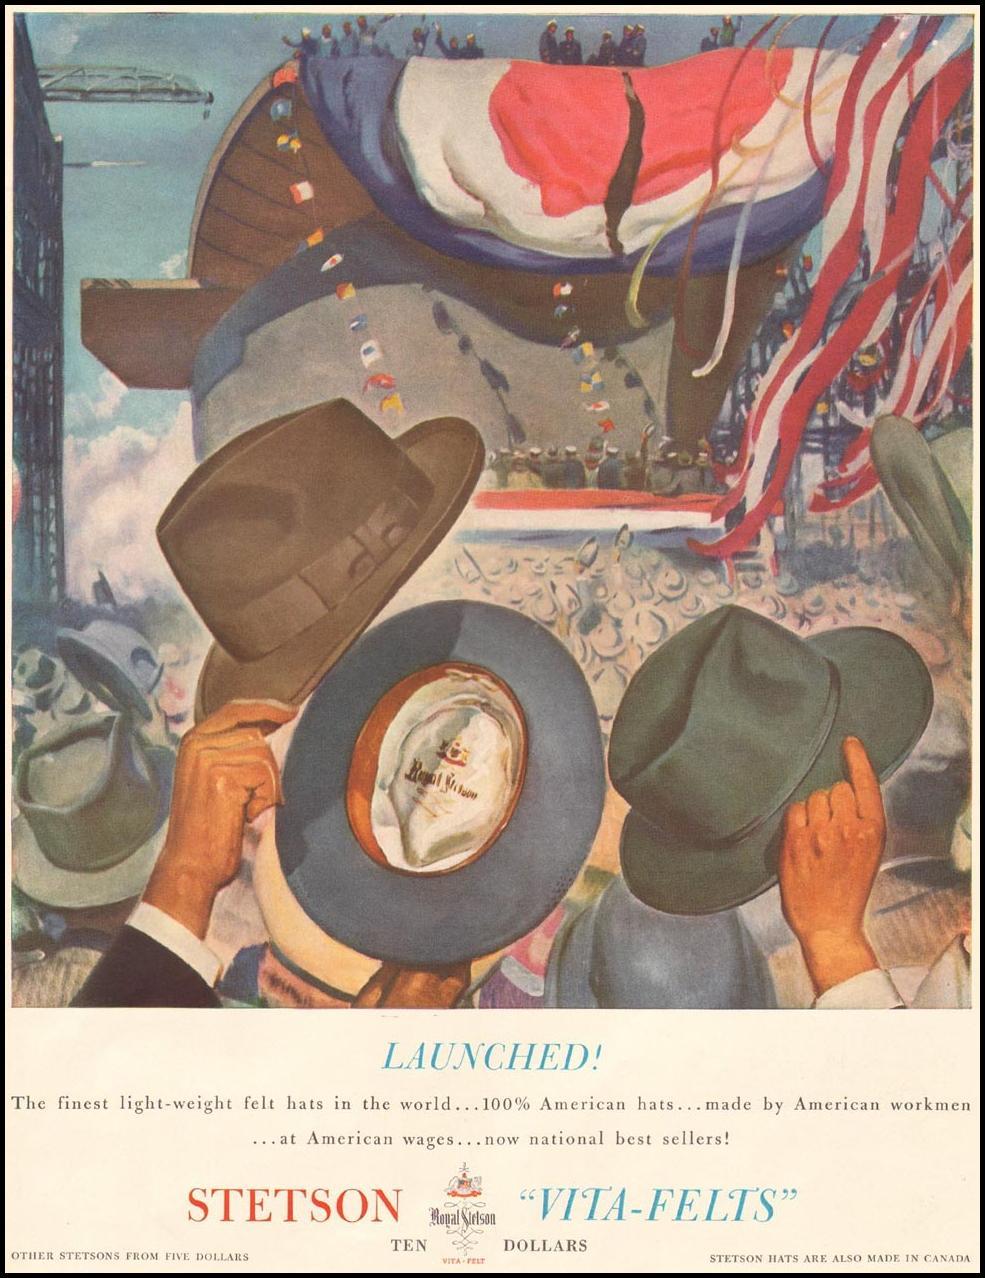 STETSON VITA-FELT HATS LIFE 09/29/1941